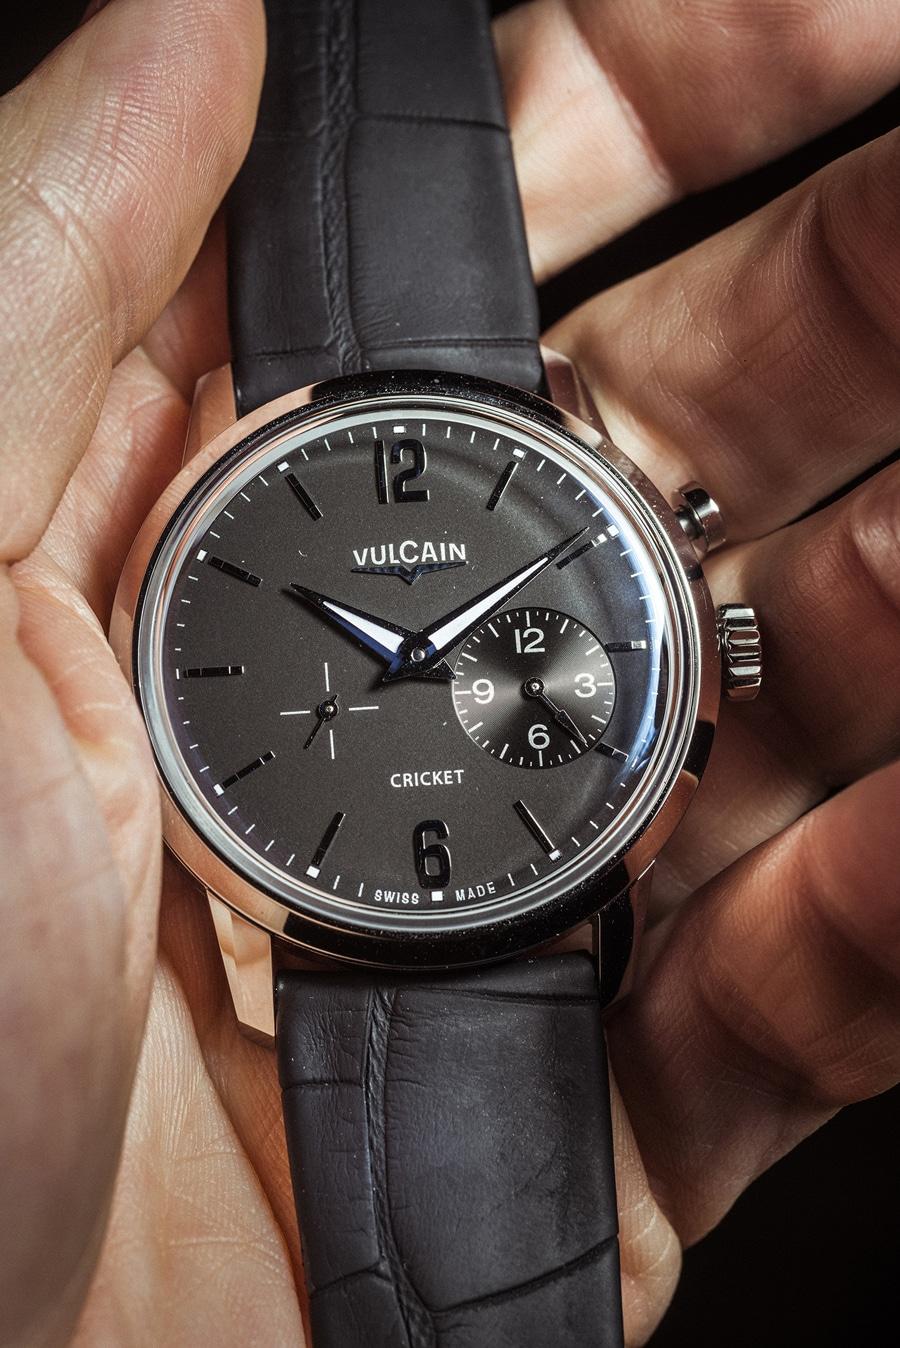 Vulcain: 50s Presidents' Watch Tradition